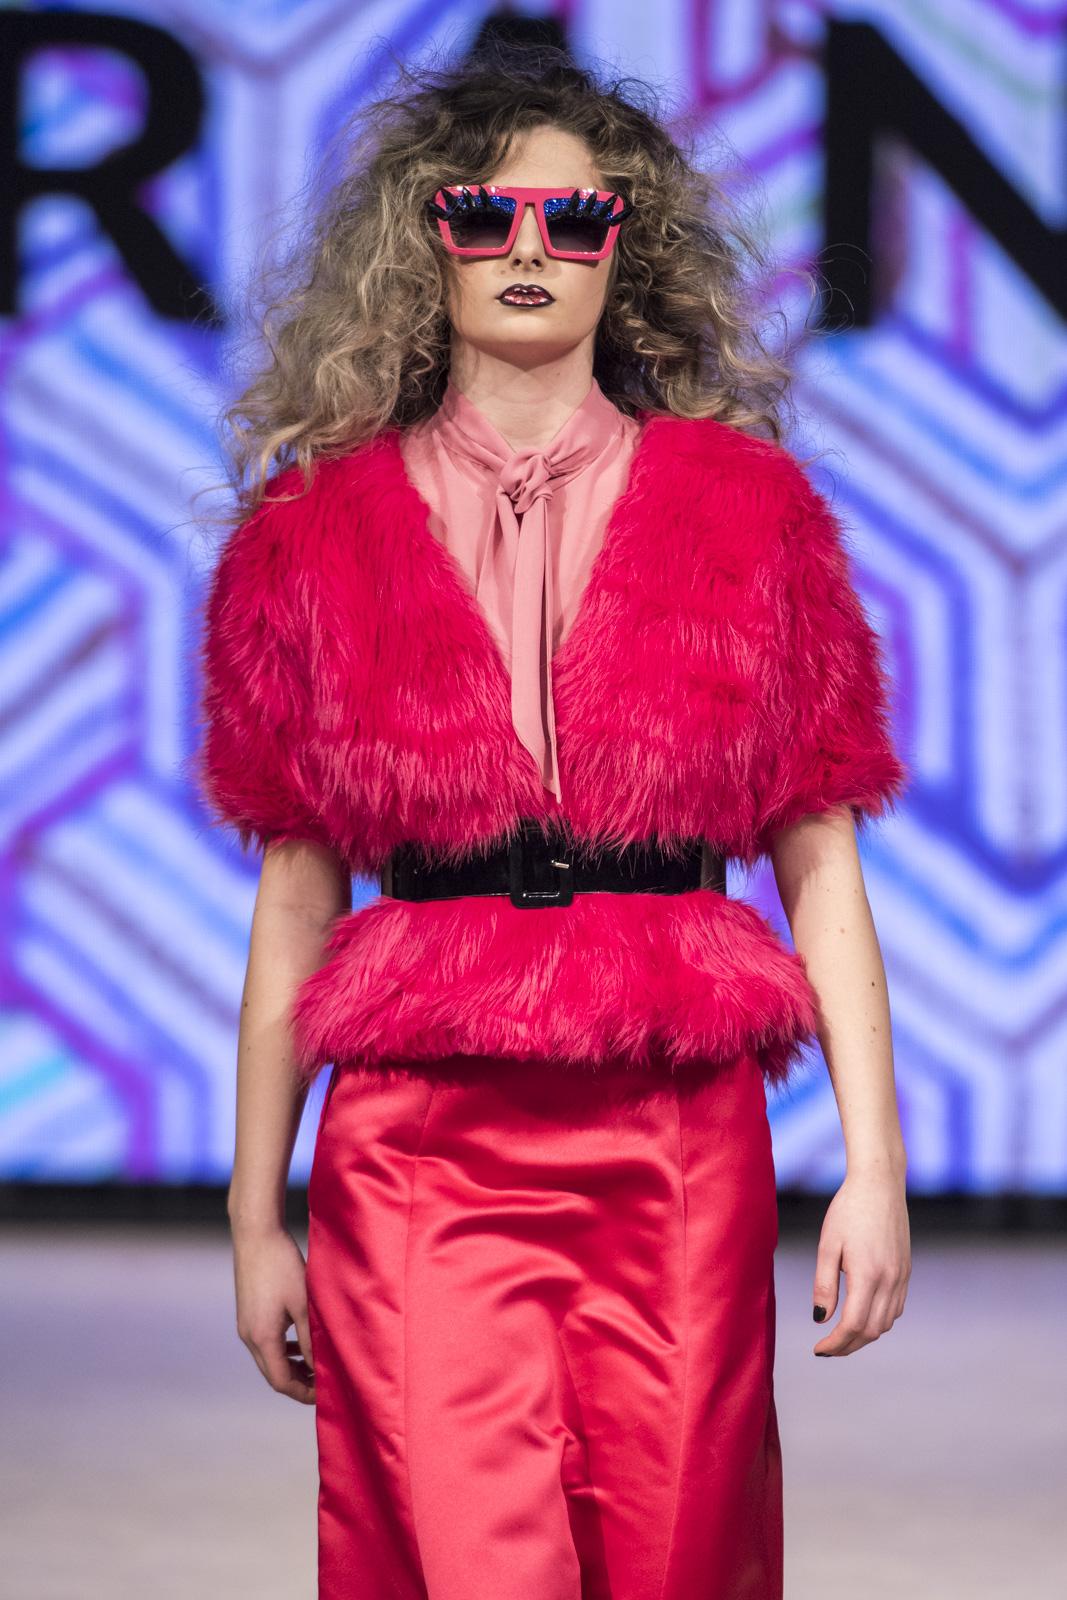 Grandi at Vancouver Fashion Week